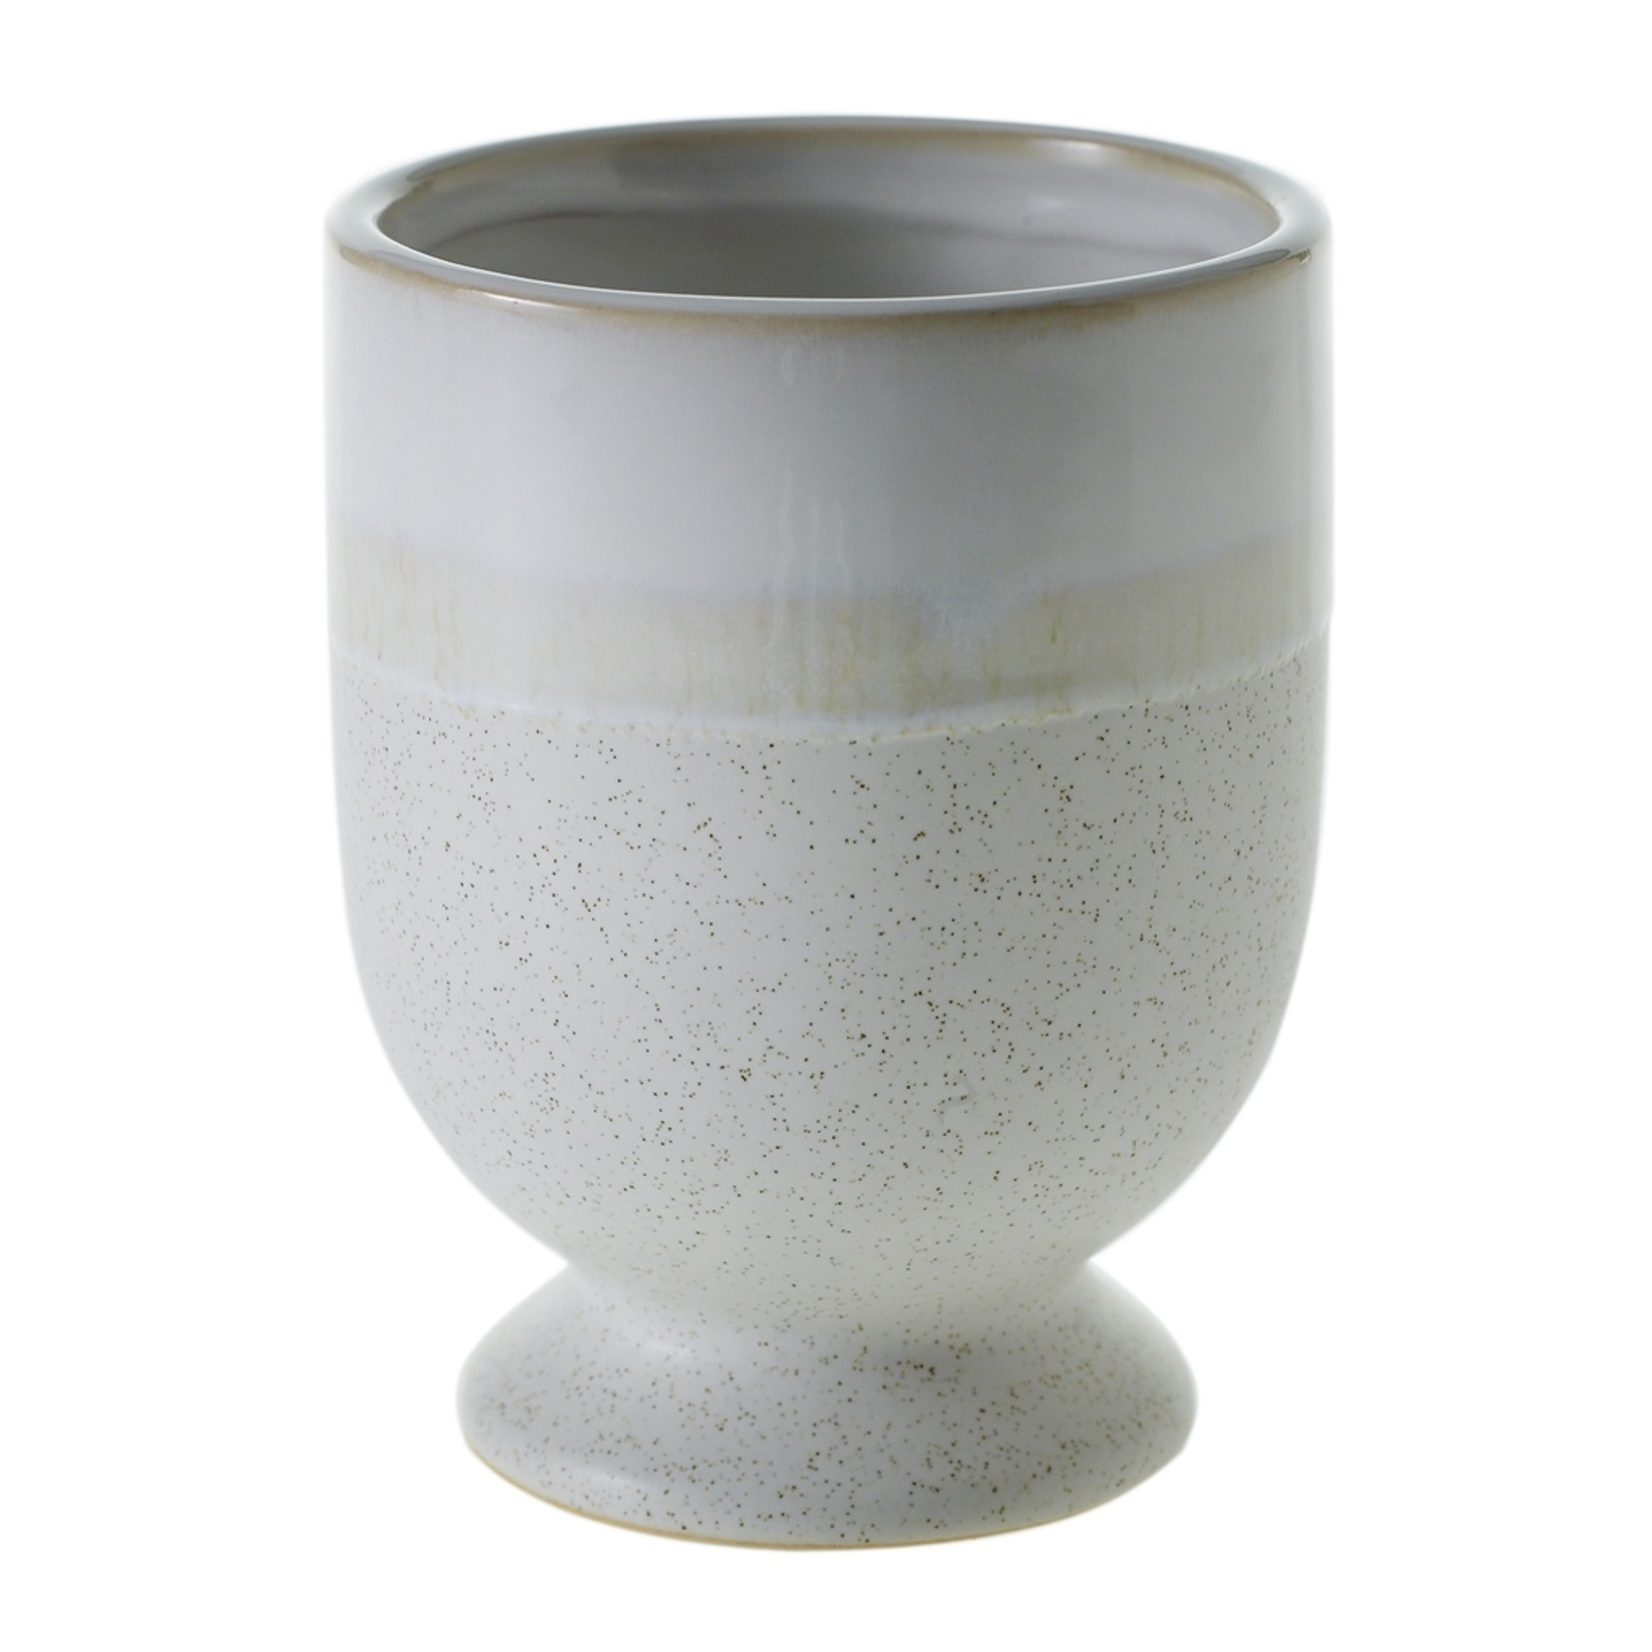 "4.25""x 5.5""H Laney Vase (AD)"